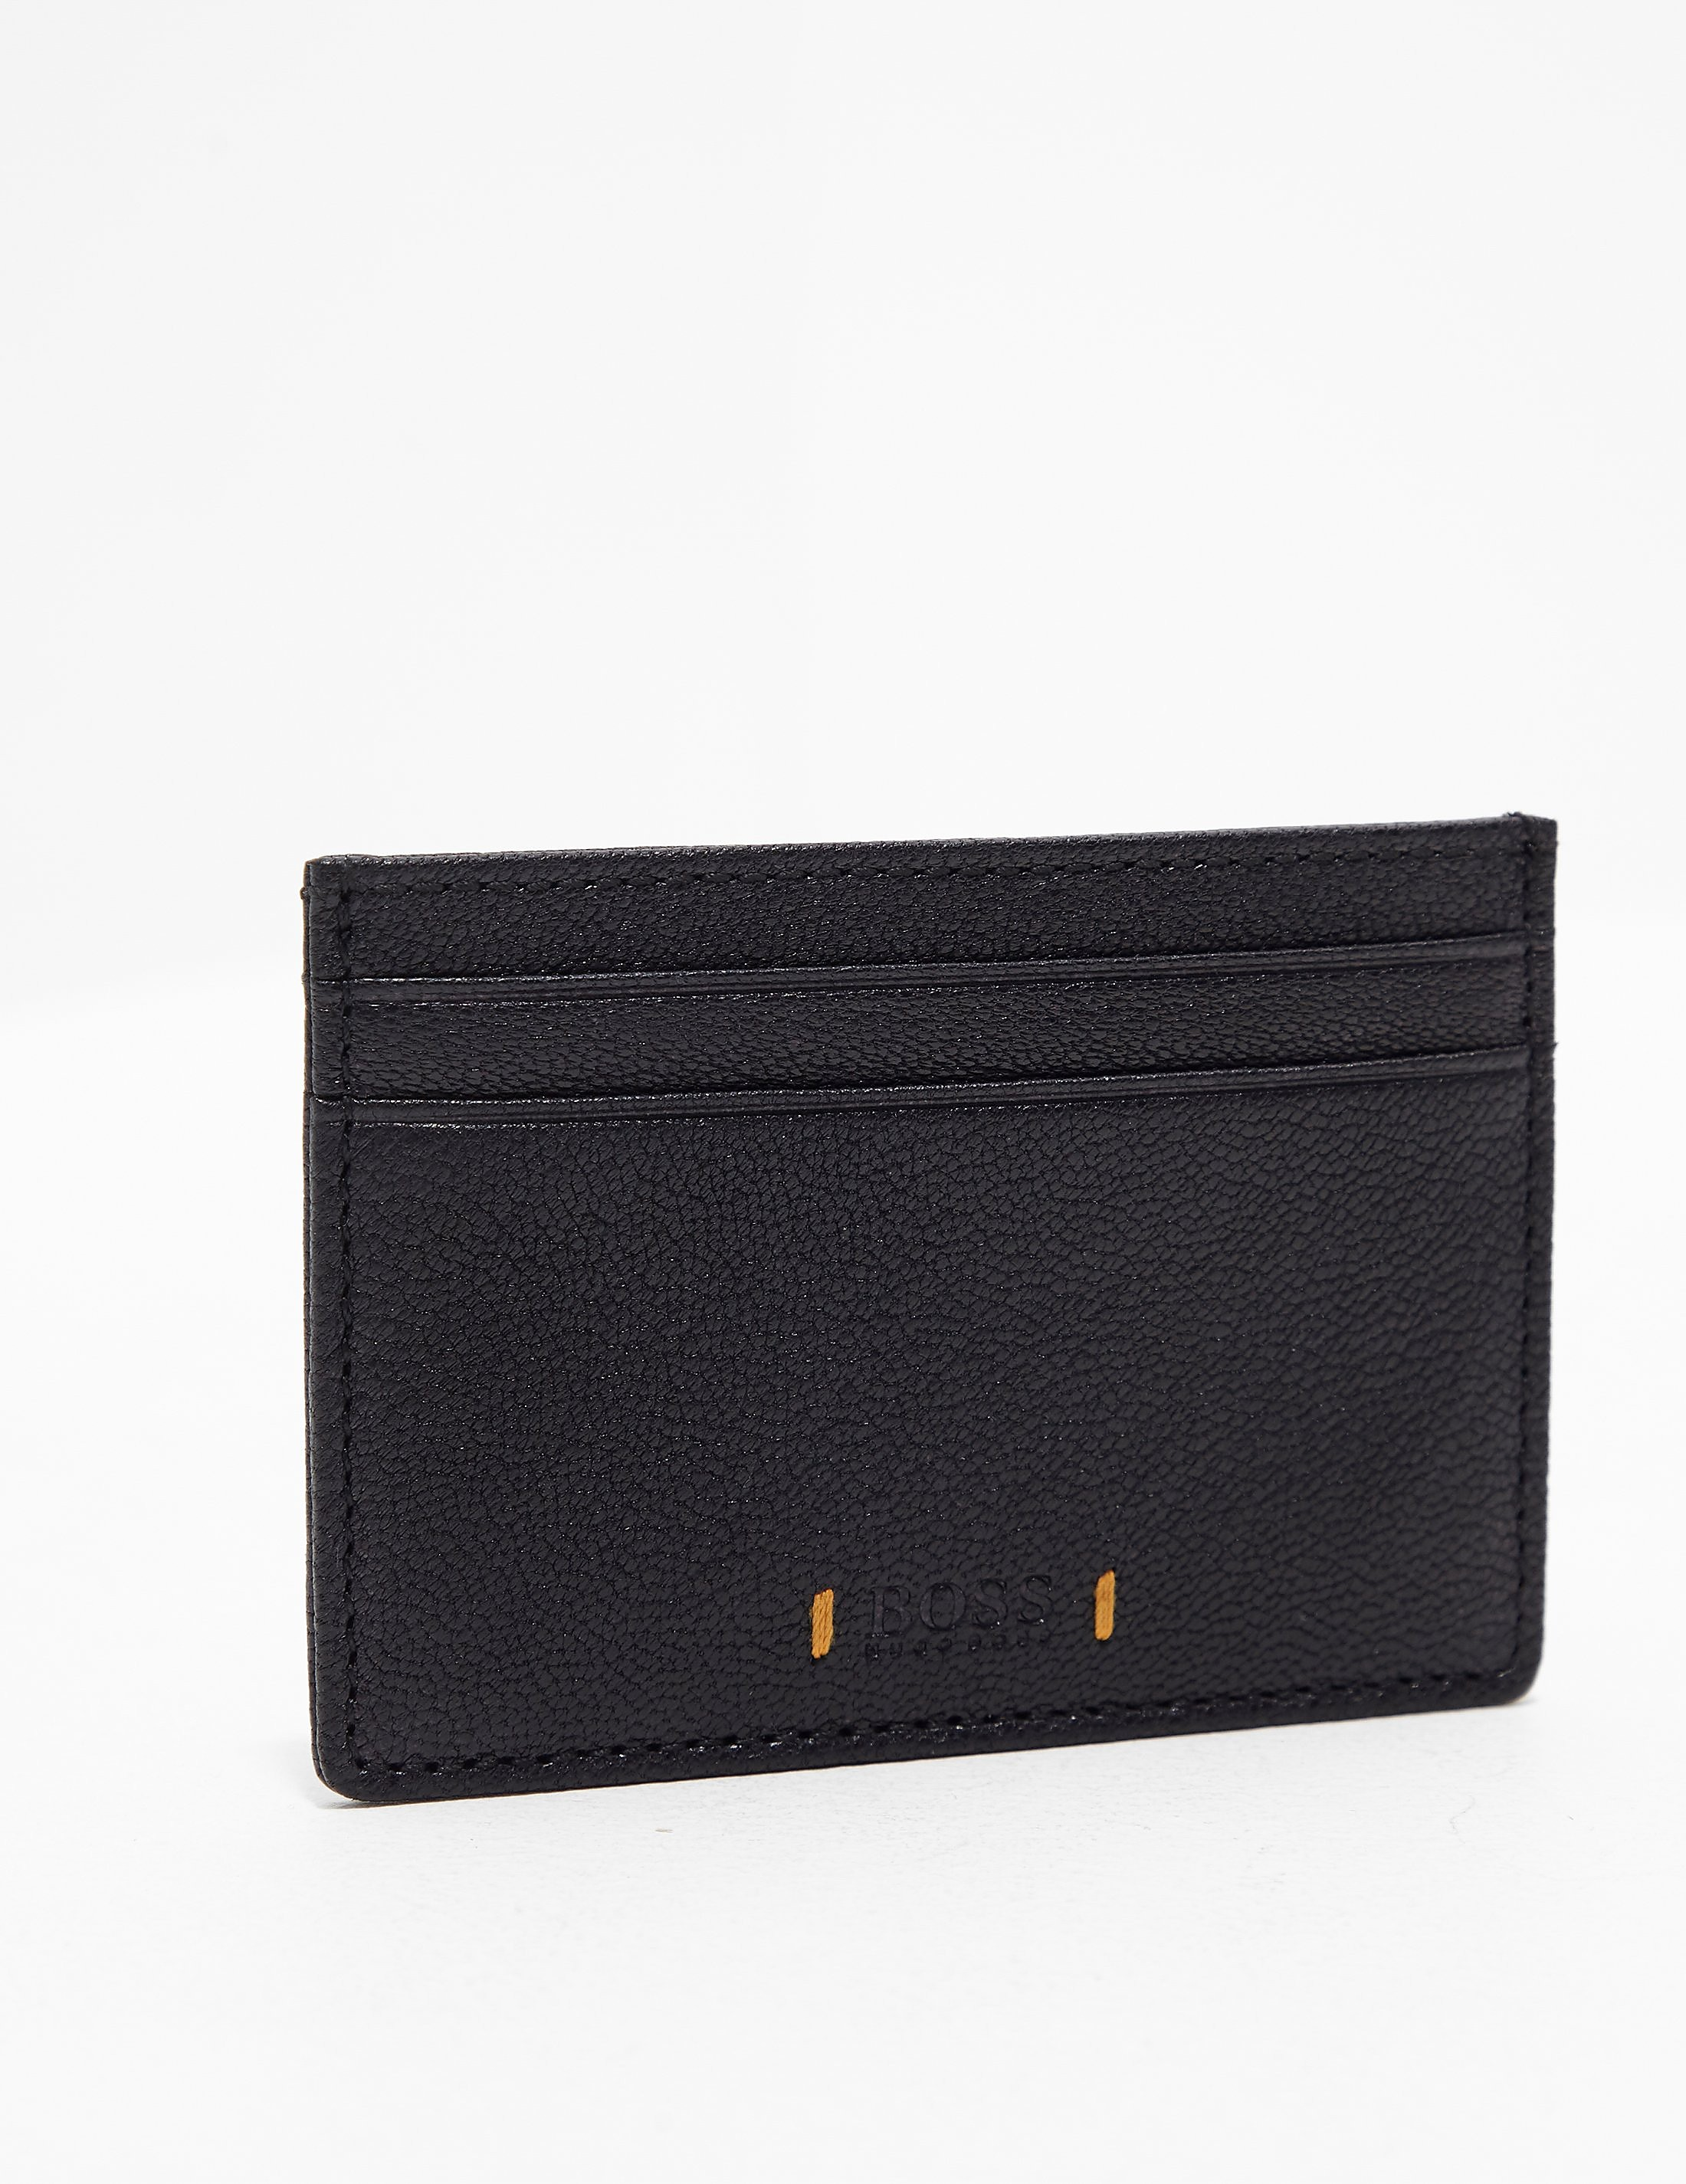 BOSS Orange Leather Card Holder